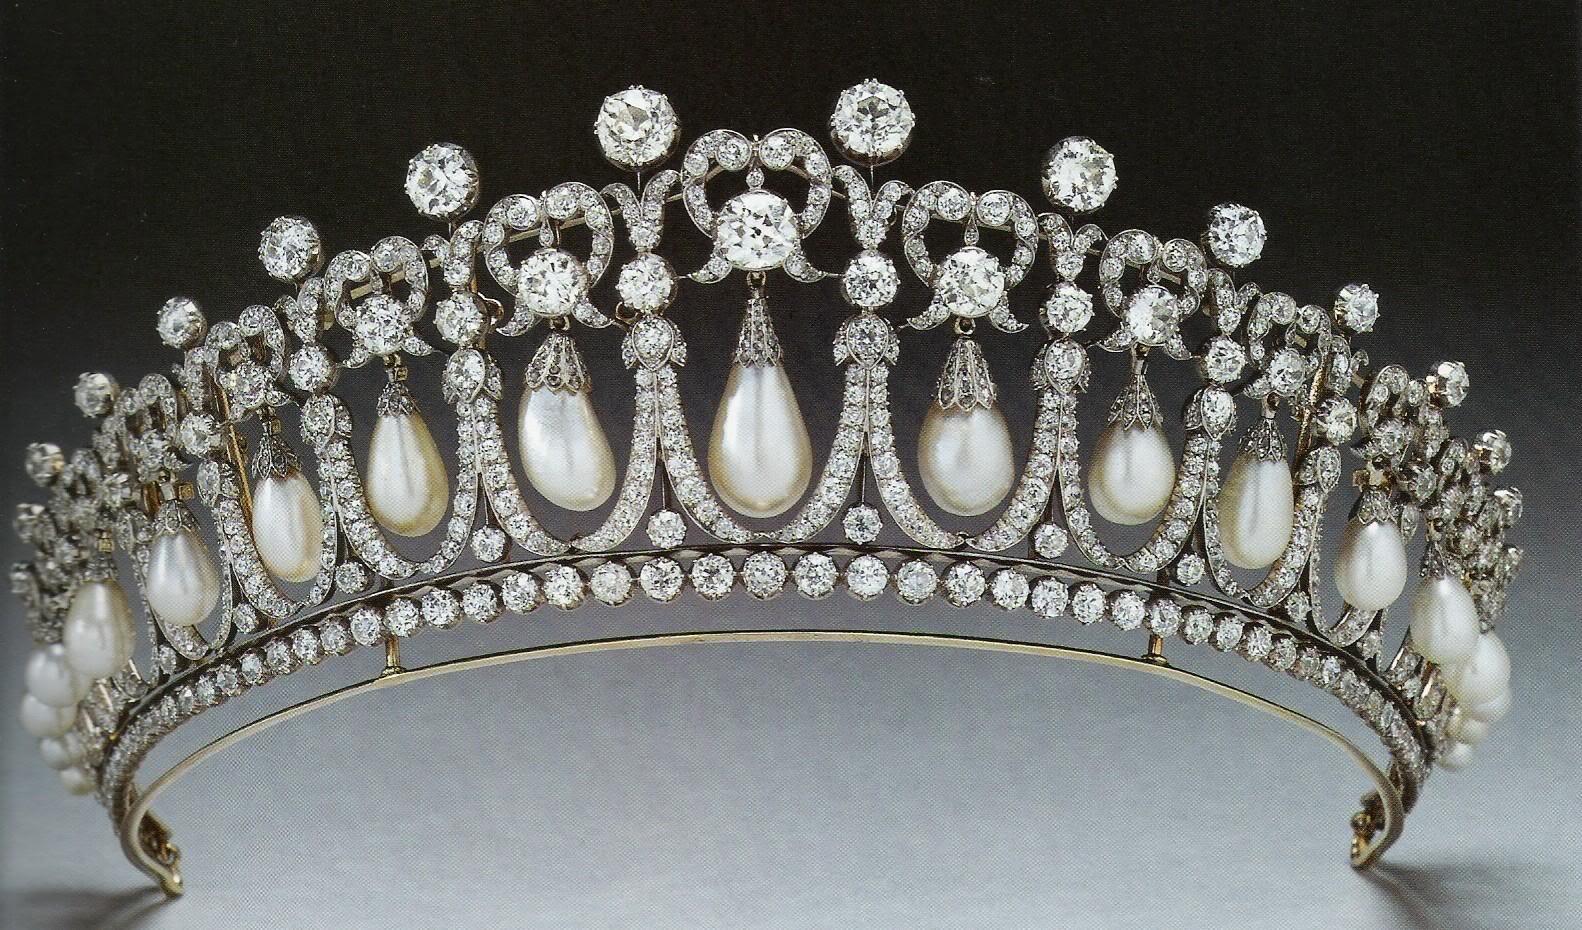 http://2.bp.blogspot.com/-QM9z_TrEa4c/UDPDMHF-inI/AAAAAAAADhY/a1CmA6SGOp8/s1600/cambridge+lovers+knot+tiara+pearl+diamond+princess+diana.jpg